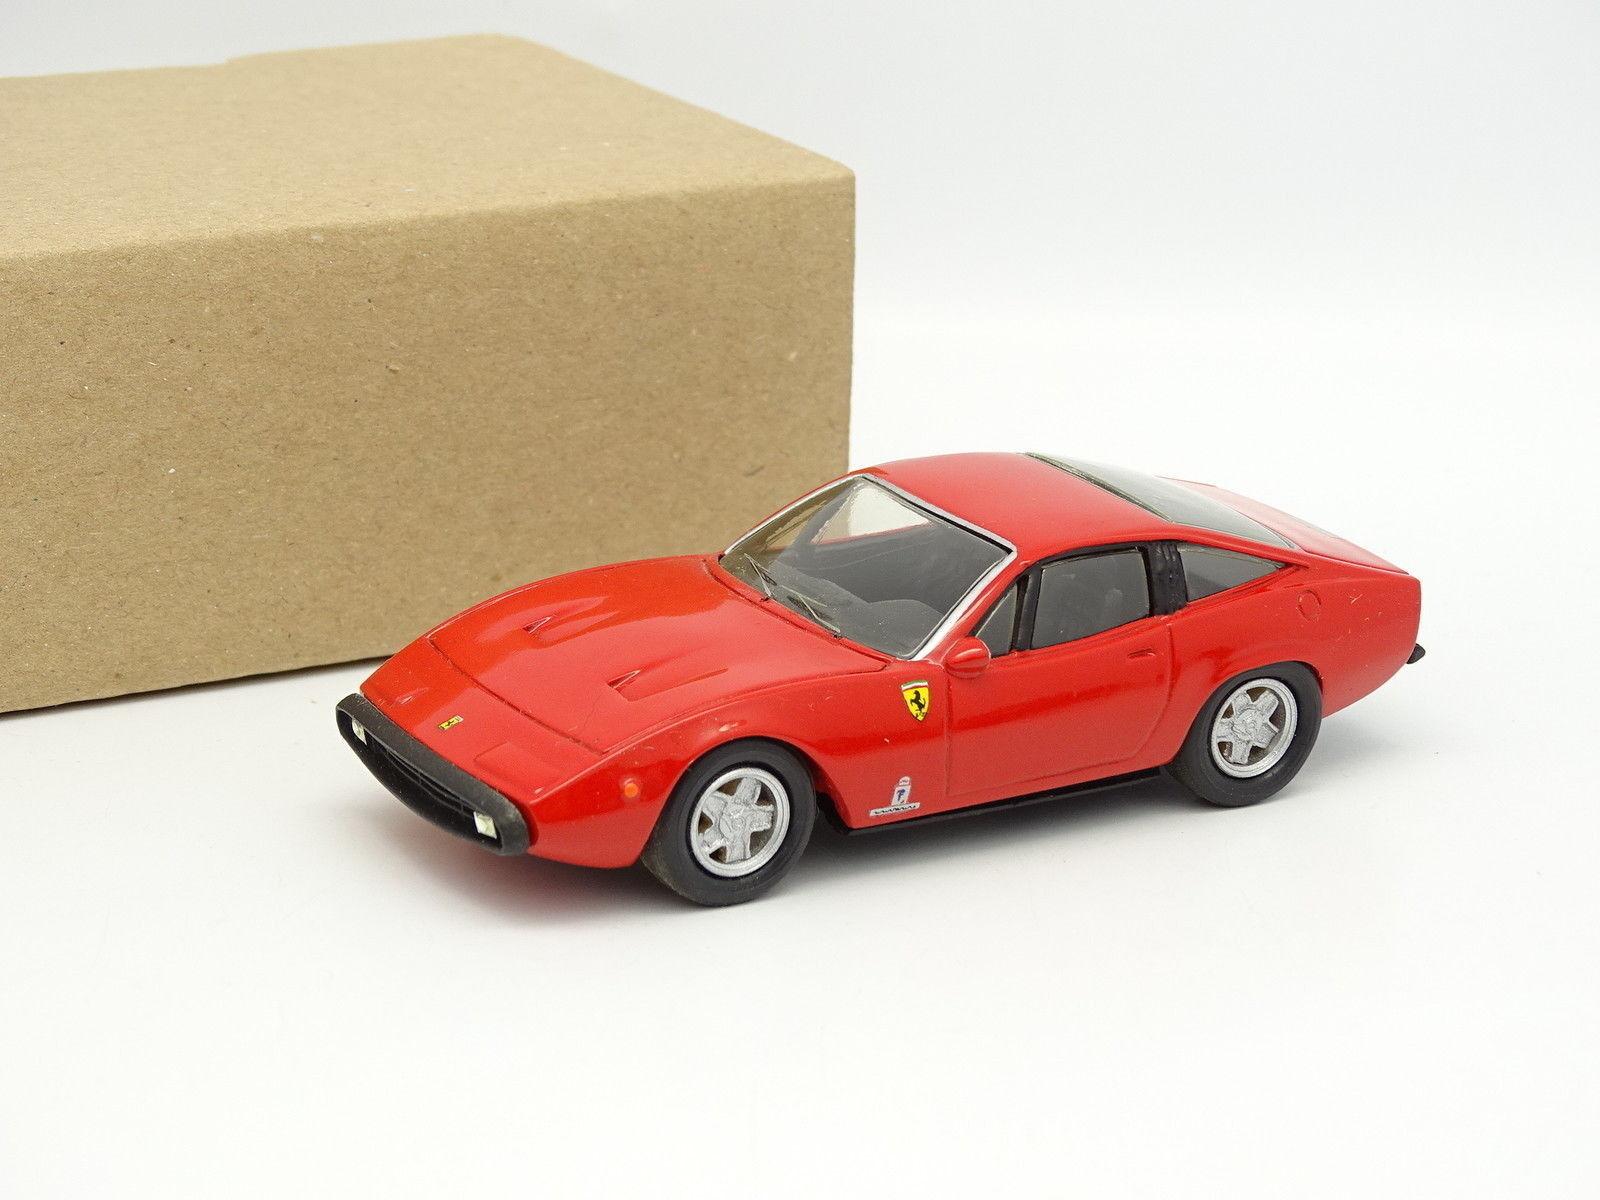 blancoa Metal Kit Monté 1 43 - Ferrari 365 GTC 4 1971 Rojo